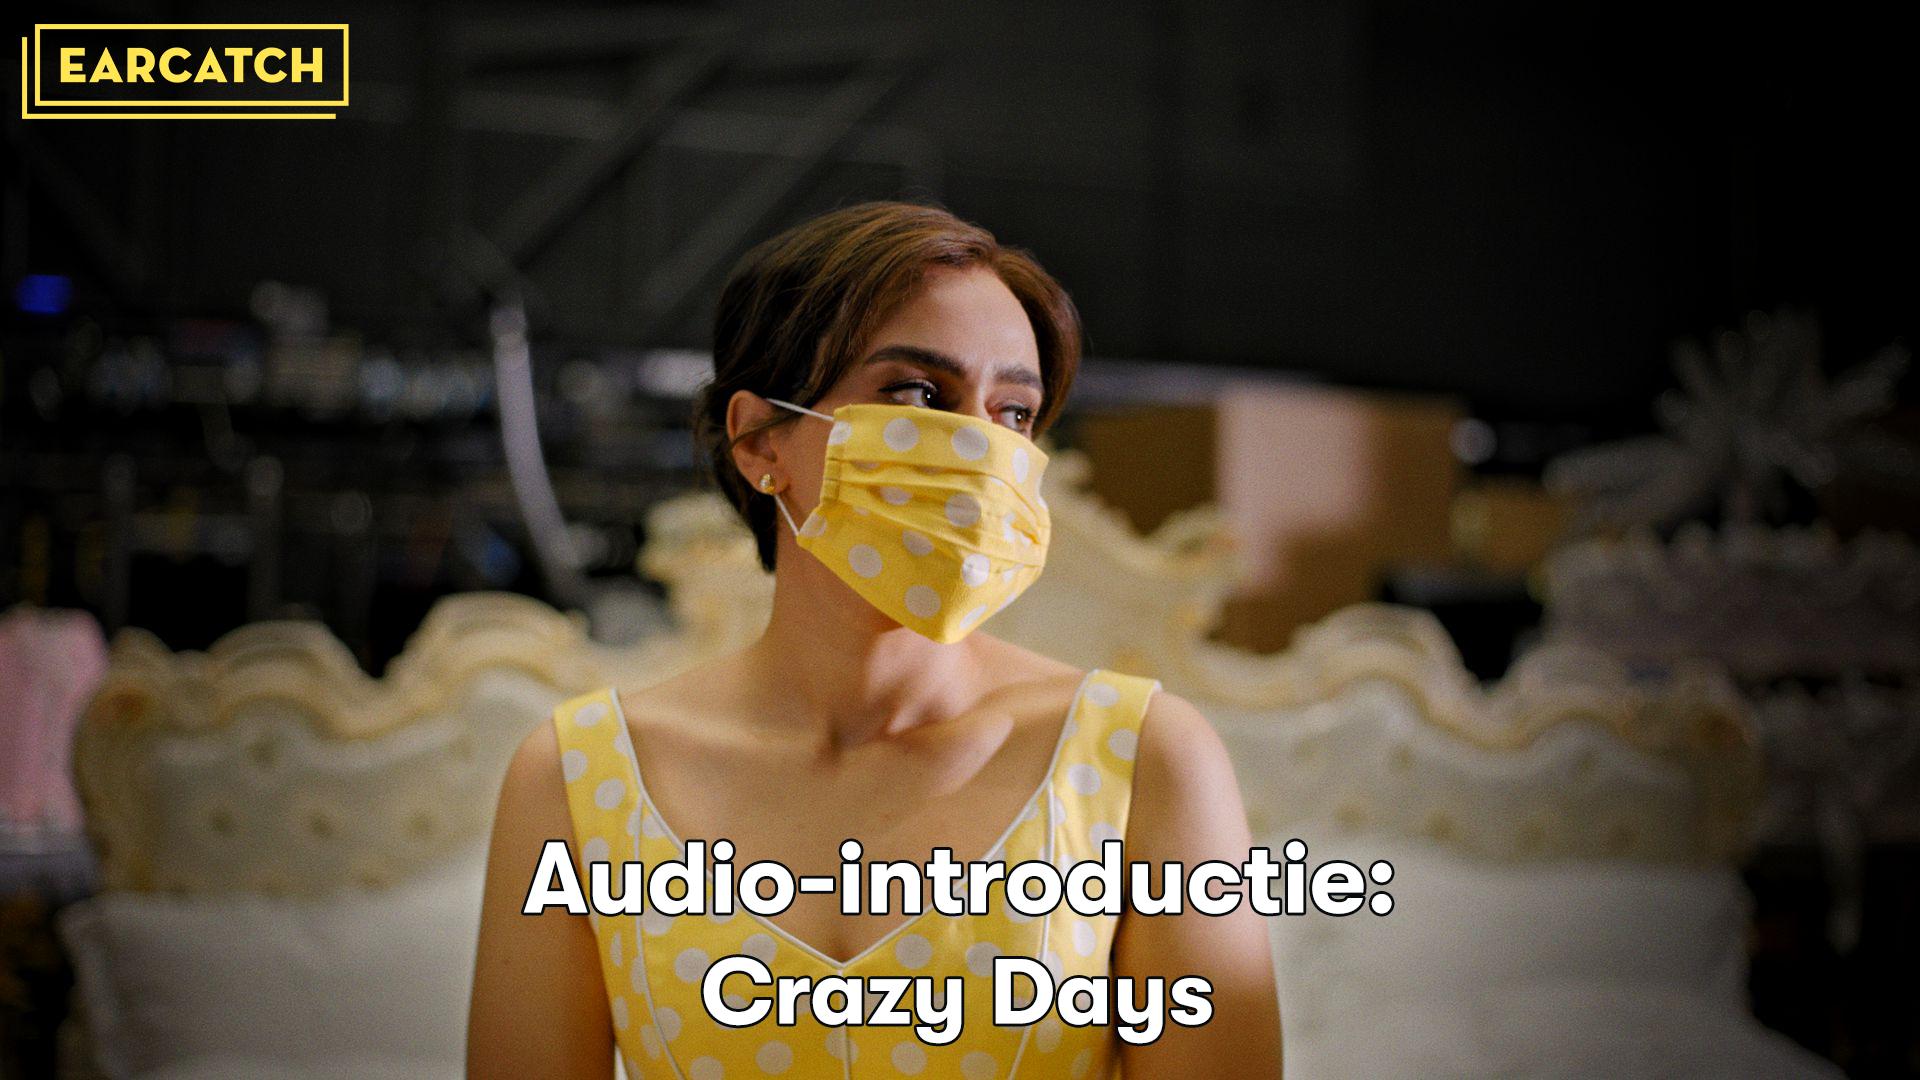 Video: Audio-introductie bij Crazy Days.